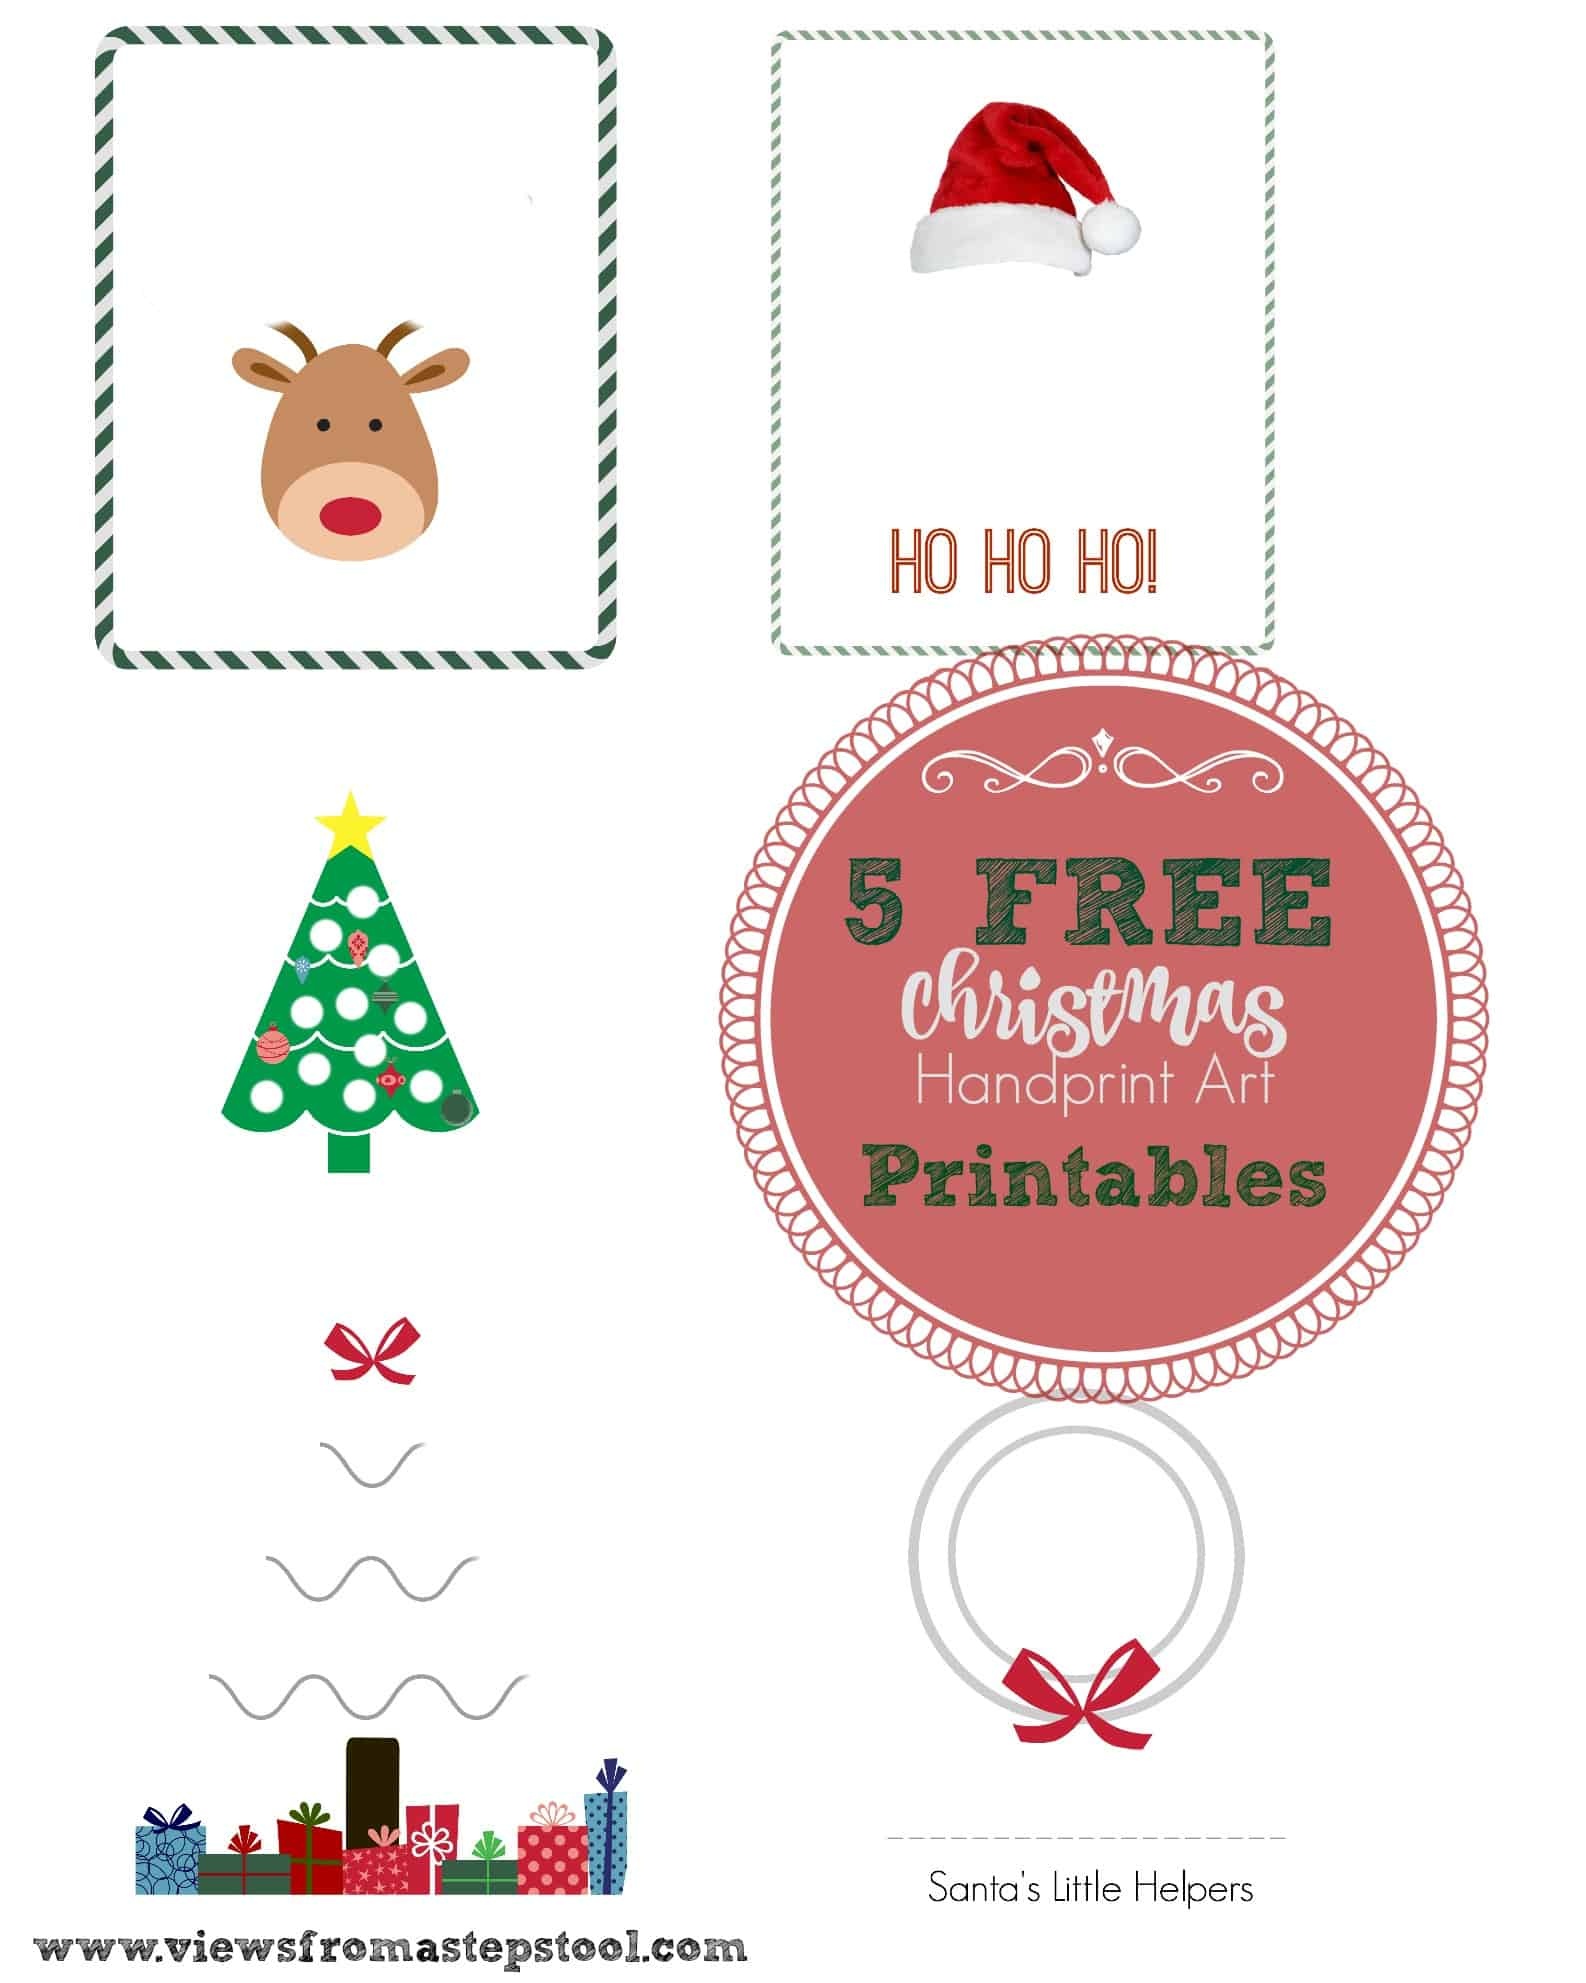 5 Christmas Handprint Art Templates For Ting Decor Or Fun